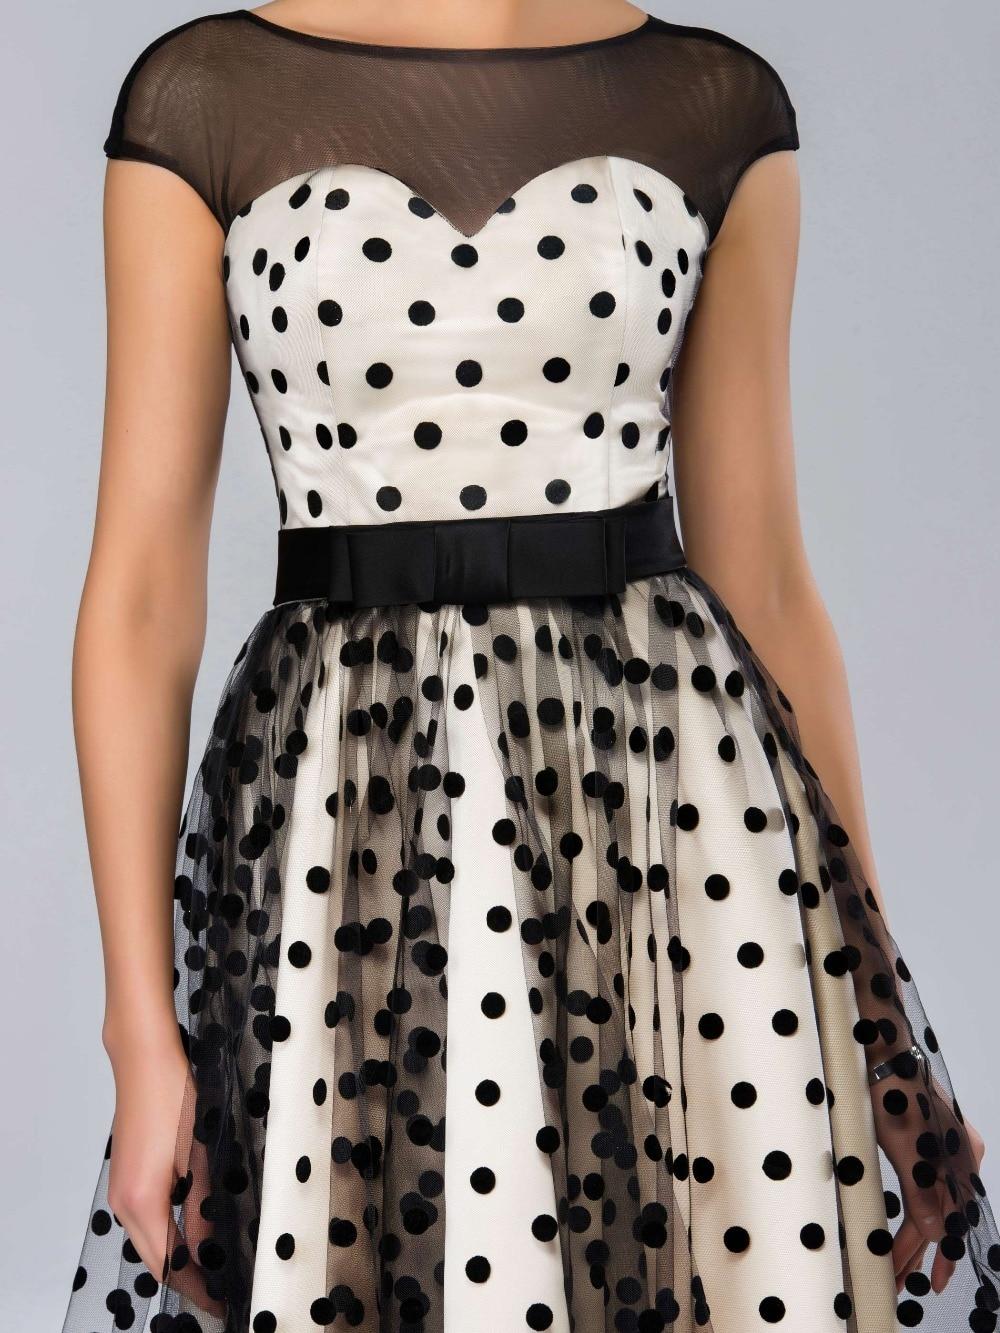 Dressv Knee-length Cocktail Dresses 2019 Polk Dot Pattern Dresses to Party Homecoming Dresses Sheer Boat Neck Graduation Dresses